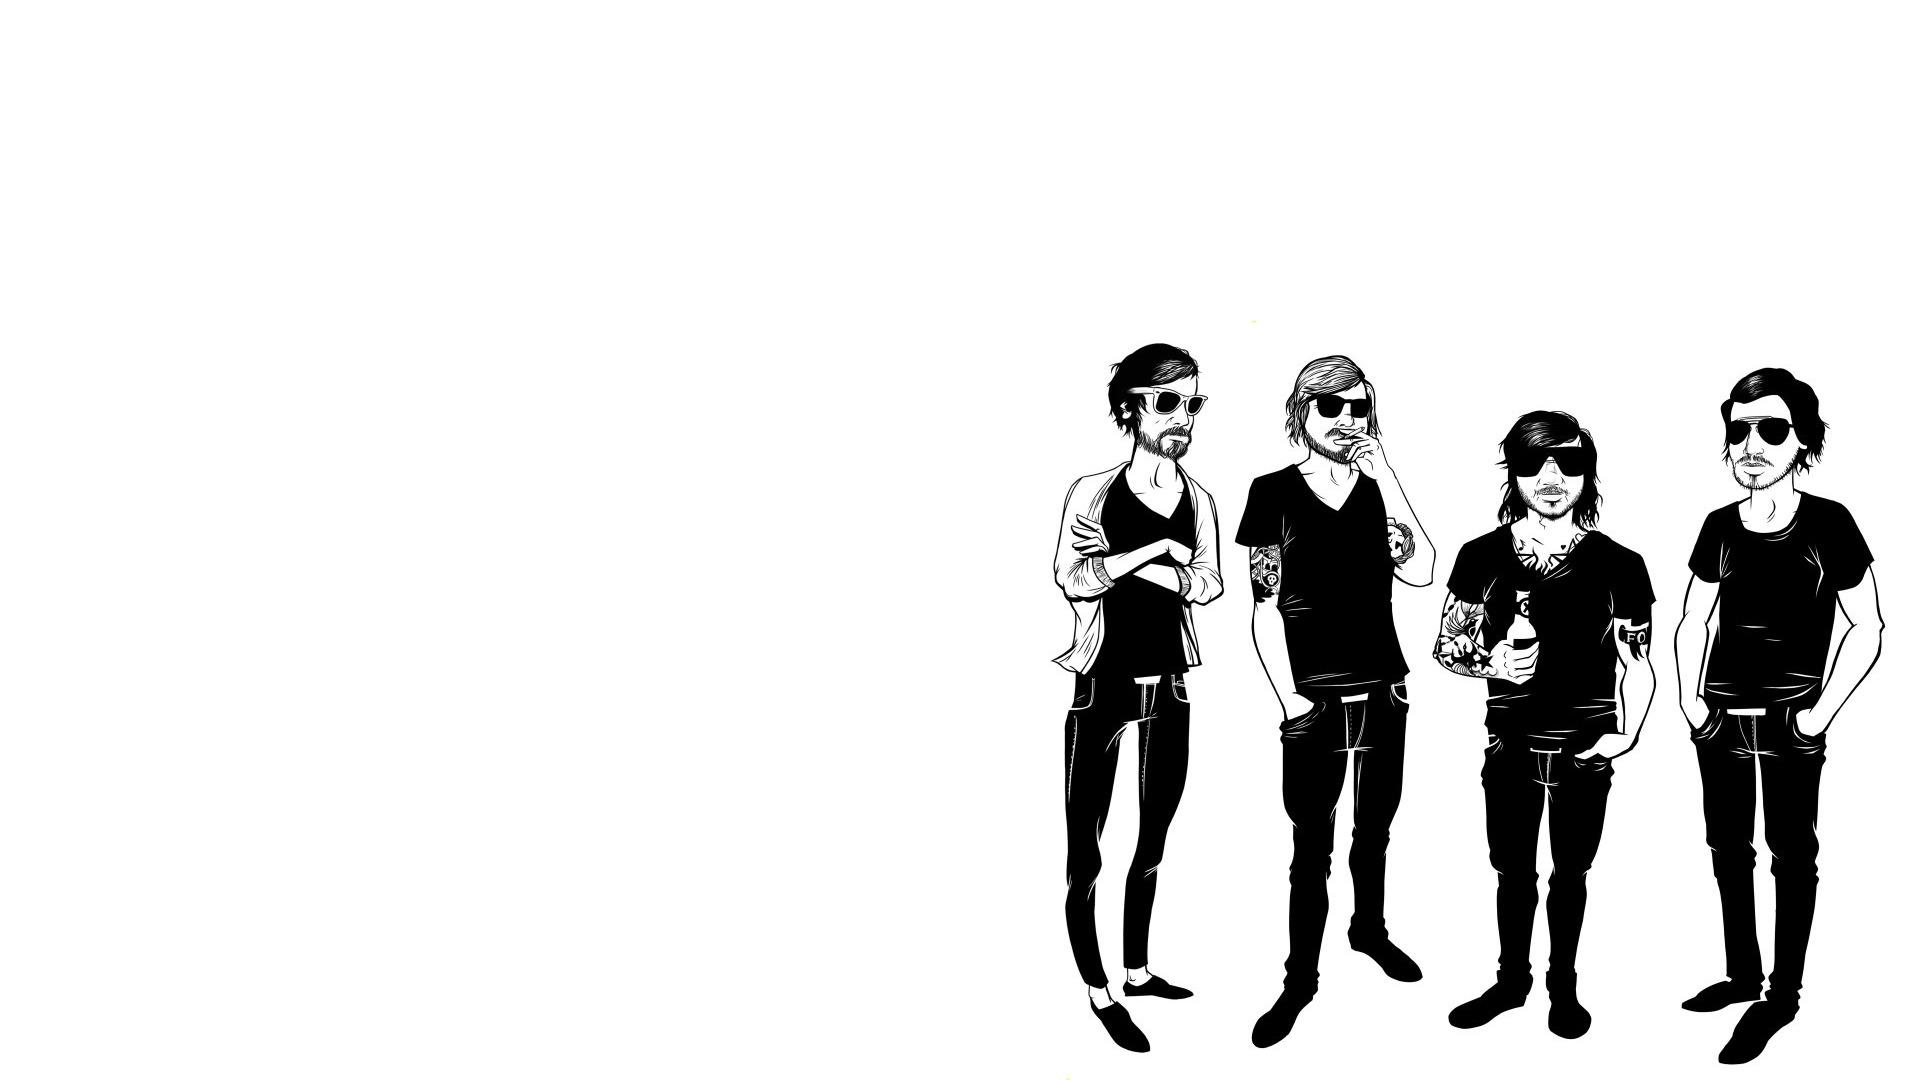 Emo Quotes Wallpaper Free Download Punk Rock Wallpapers Free Download Pixelstalk Net